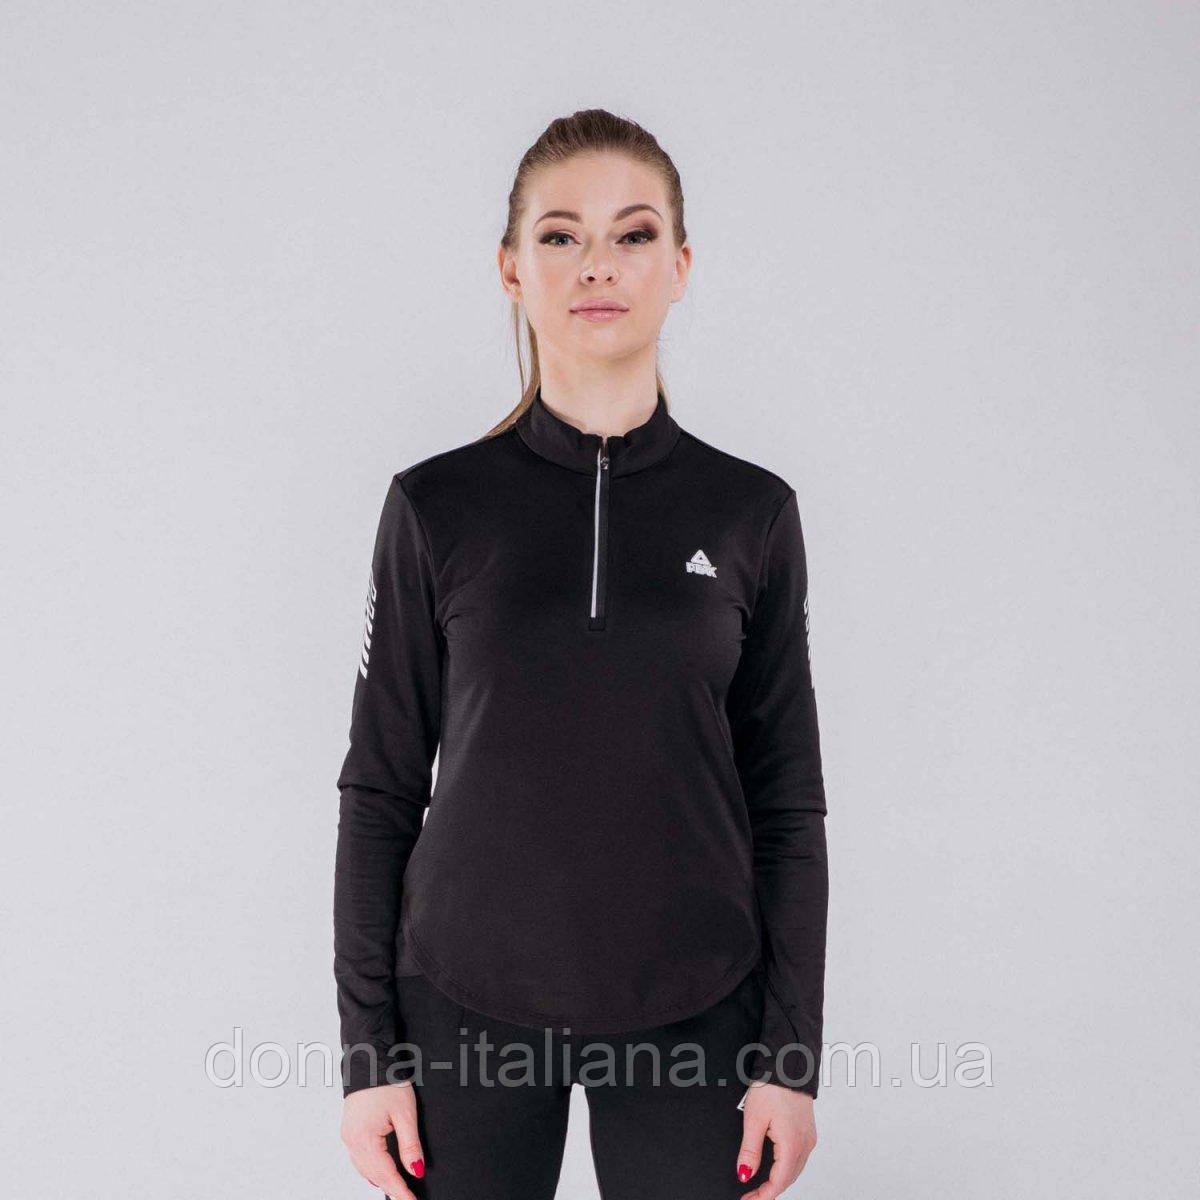 Спортивная кофта Peak Sport FW684088-BLA L Черный (6941441508967)